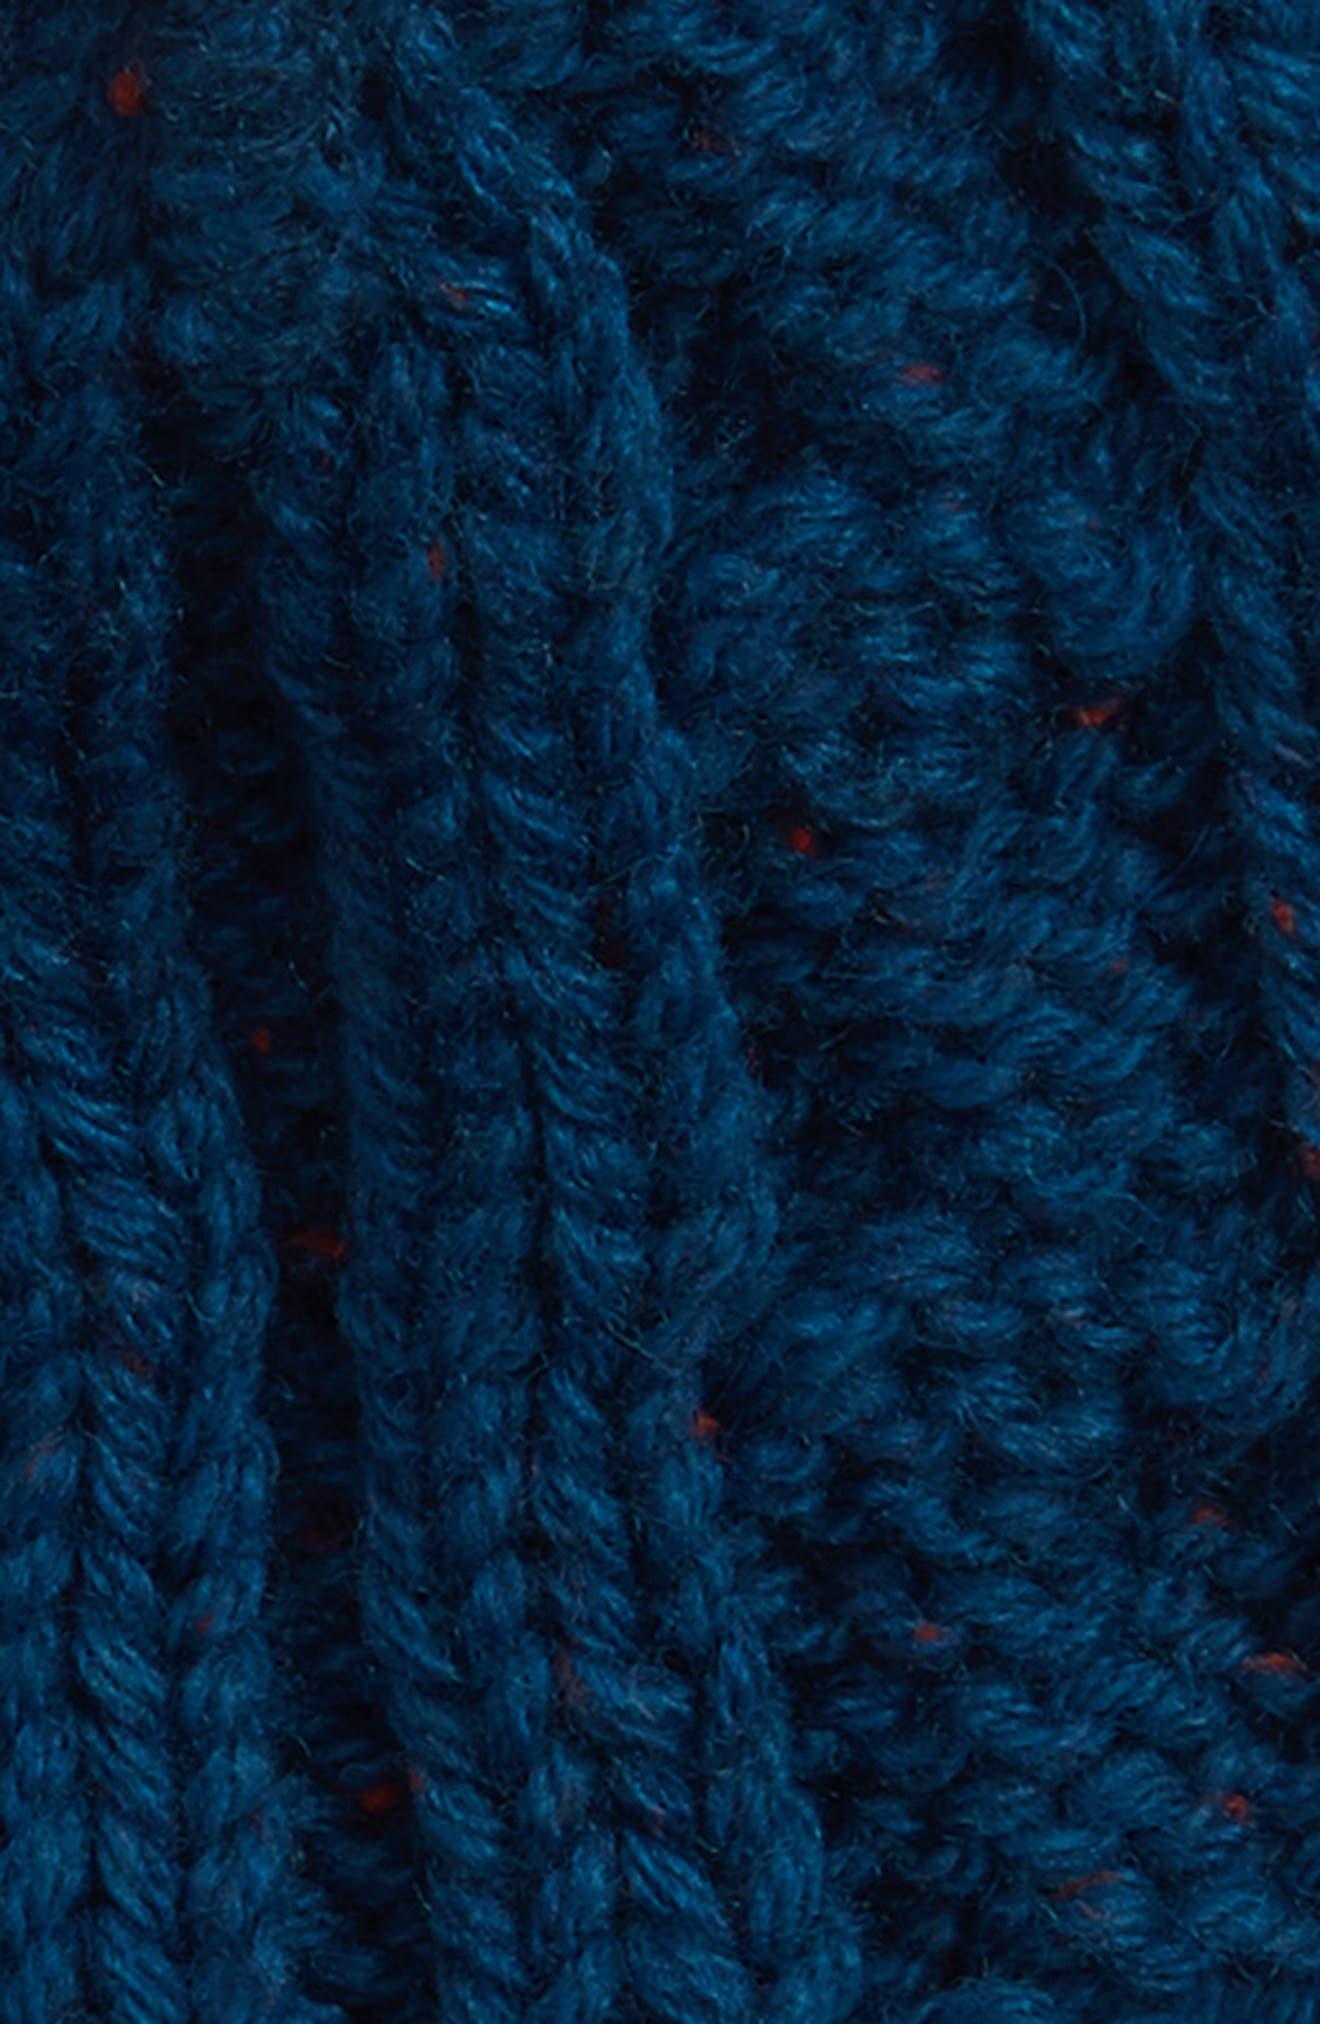 Sportswear Women's Beanie,                             Alternate thumbnail 4, color,                             BLUE/ HABANERO RED/ SILVER